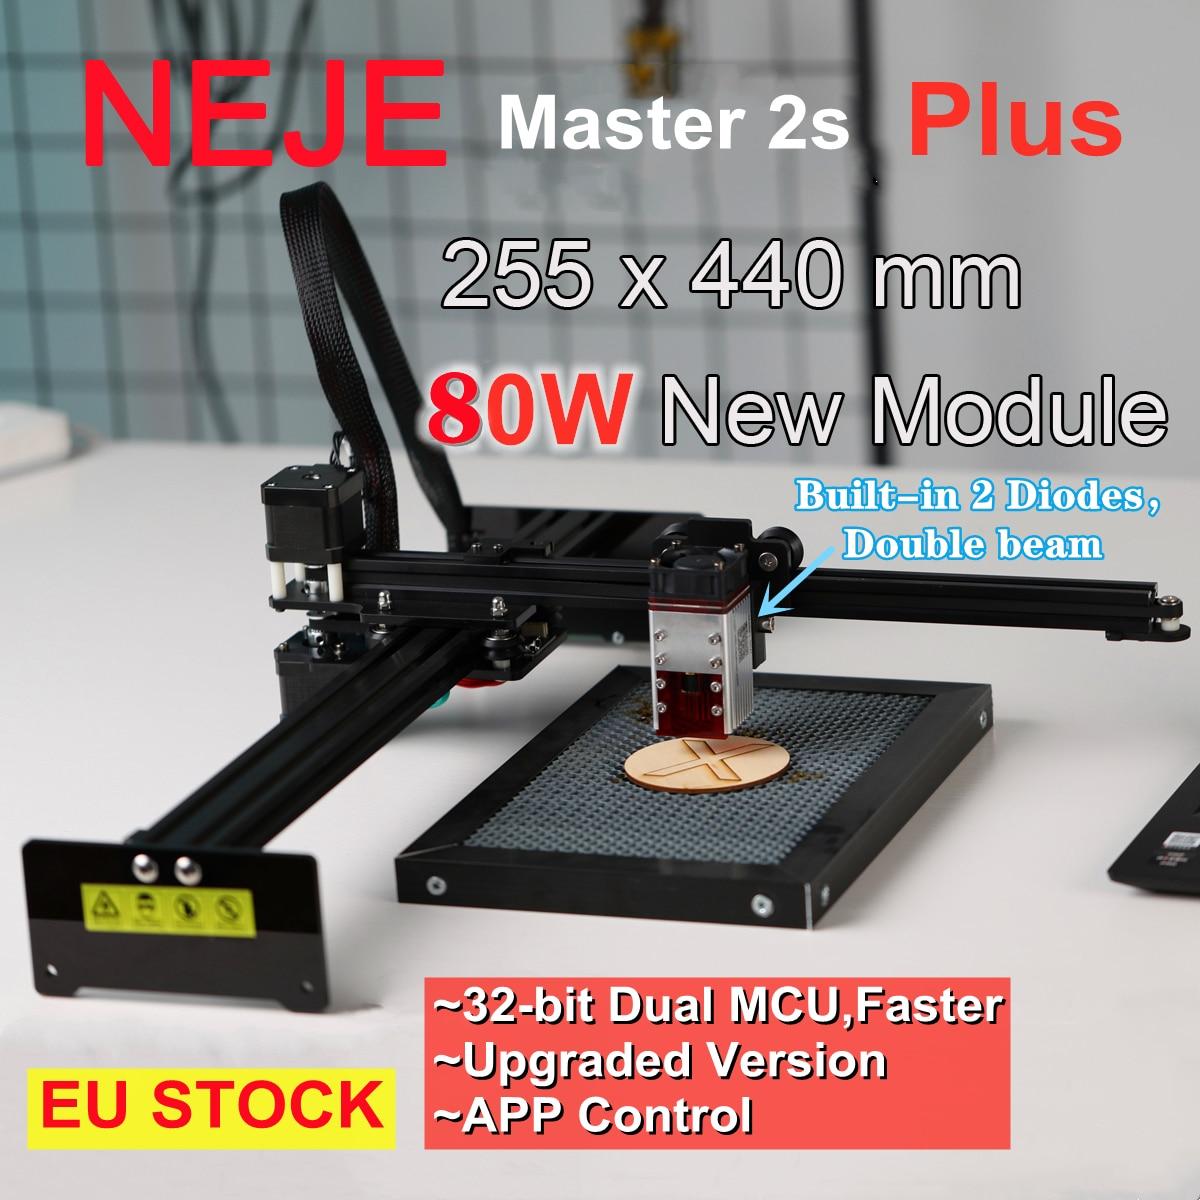 NEJE Master 2S Plus 80W CNC Router Laser Cutter Engraver Engraving Machine Lightburn for Wood Leather Plywood MDF 3D Printer